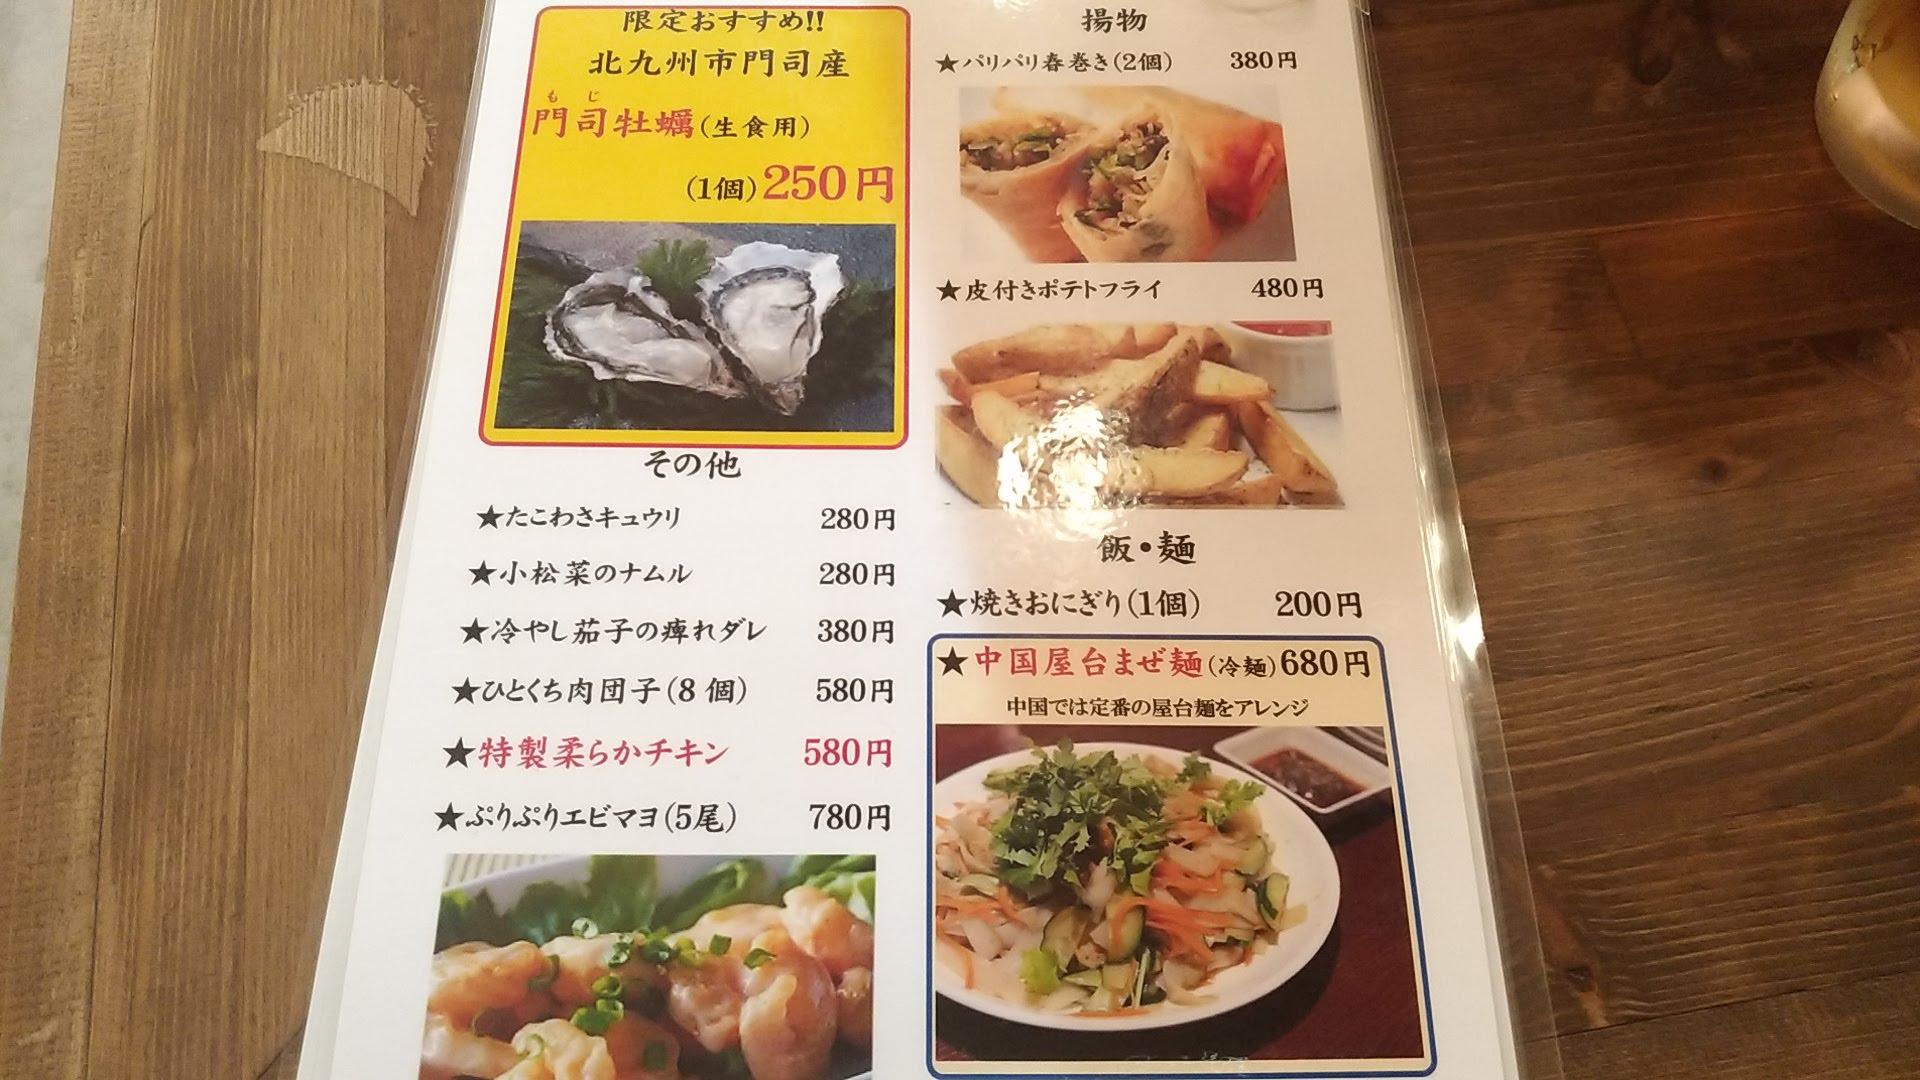 The food menu of Shinka 1